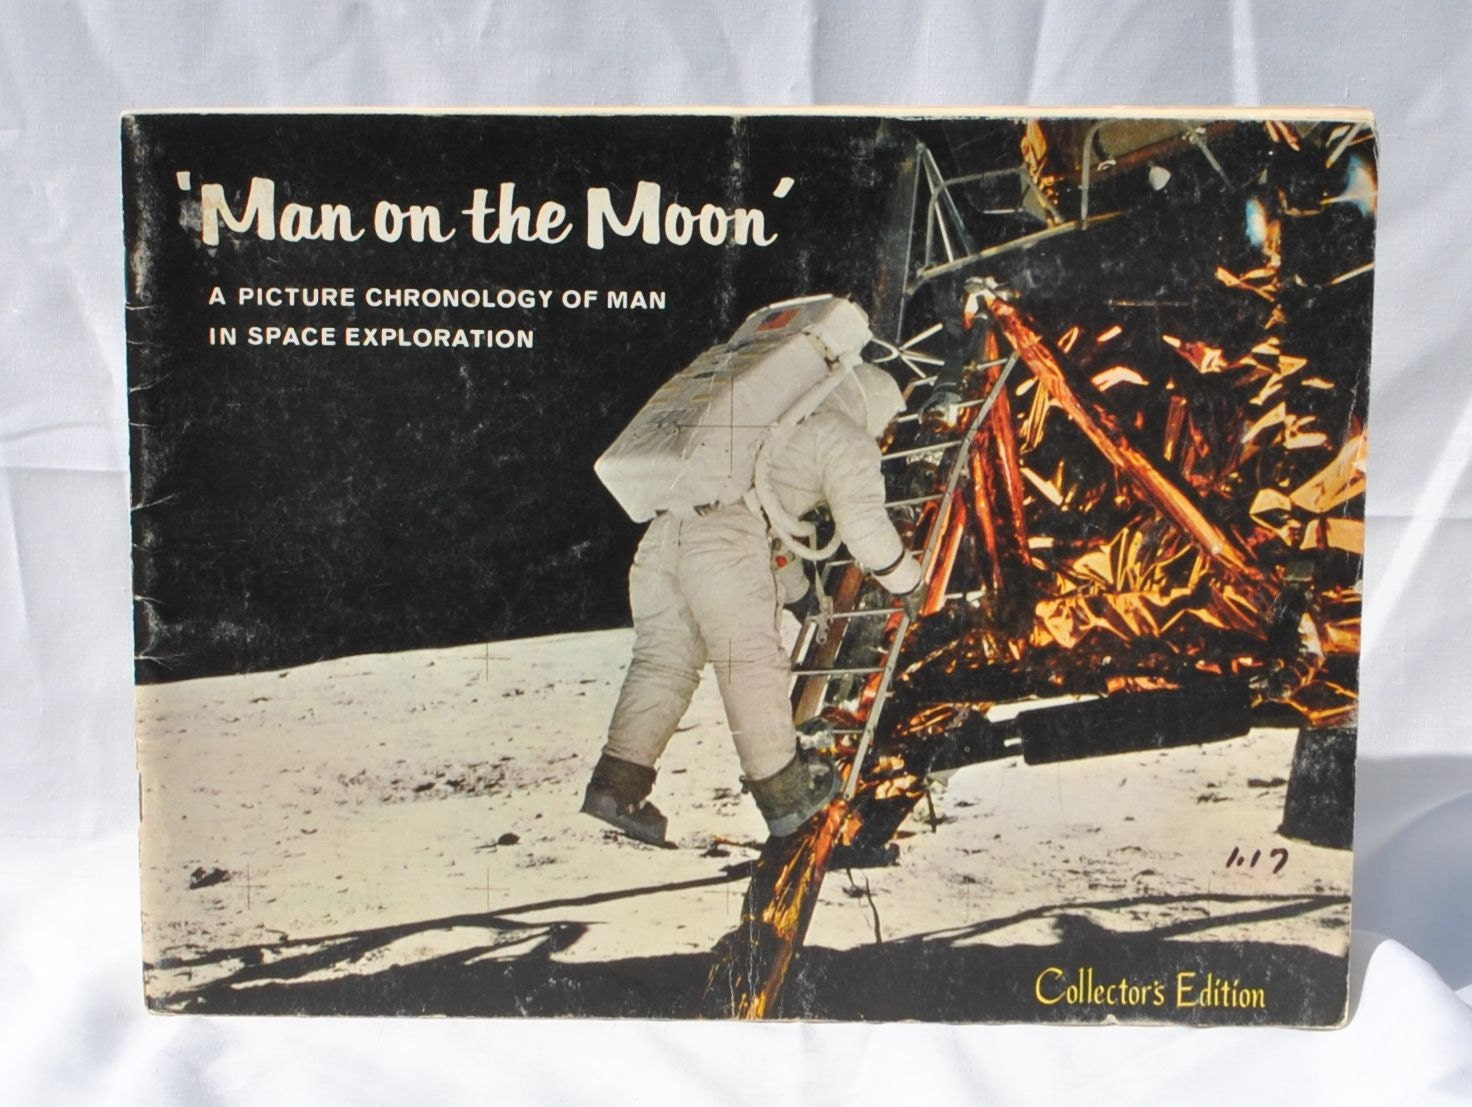 Vintage Man On The Moon Collectors Edition Book 1969 Paperback Apollo 11 Mission Milestones Space Progress Astronauts Mars